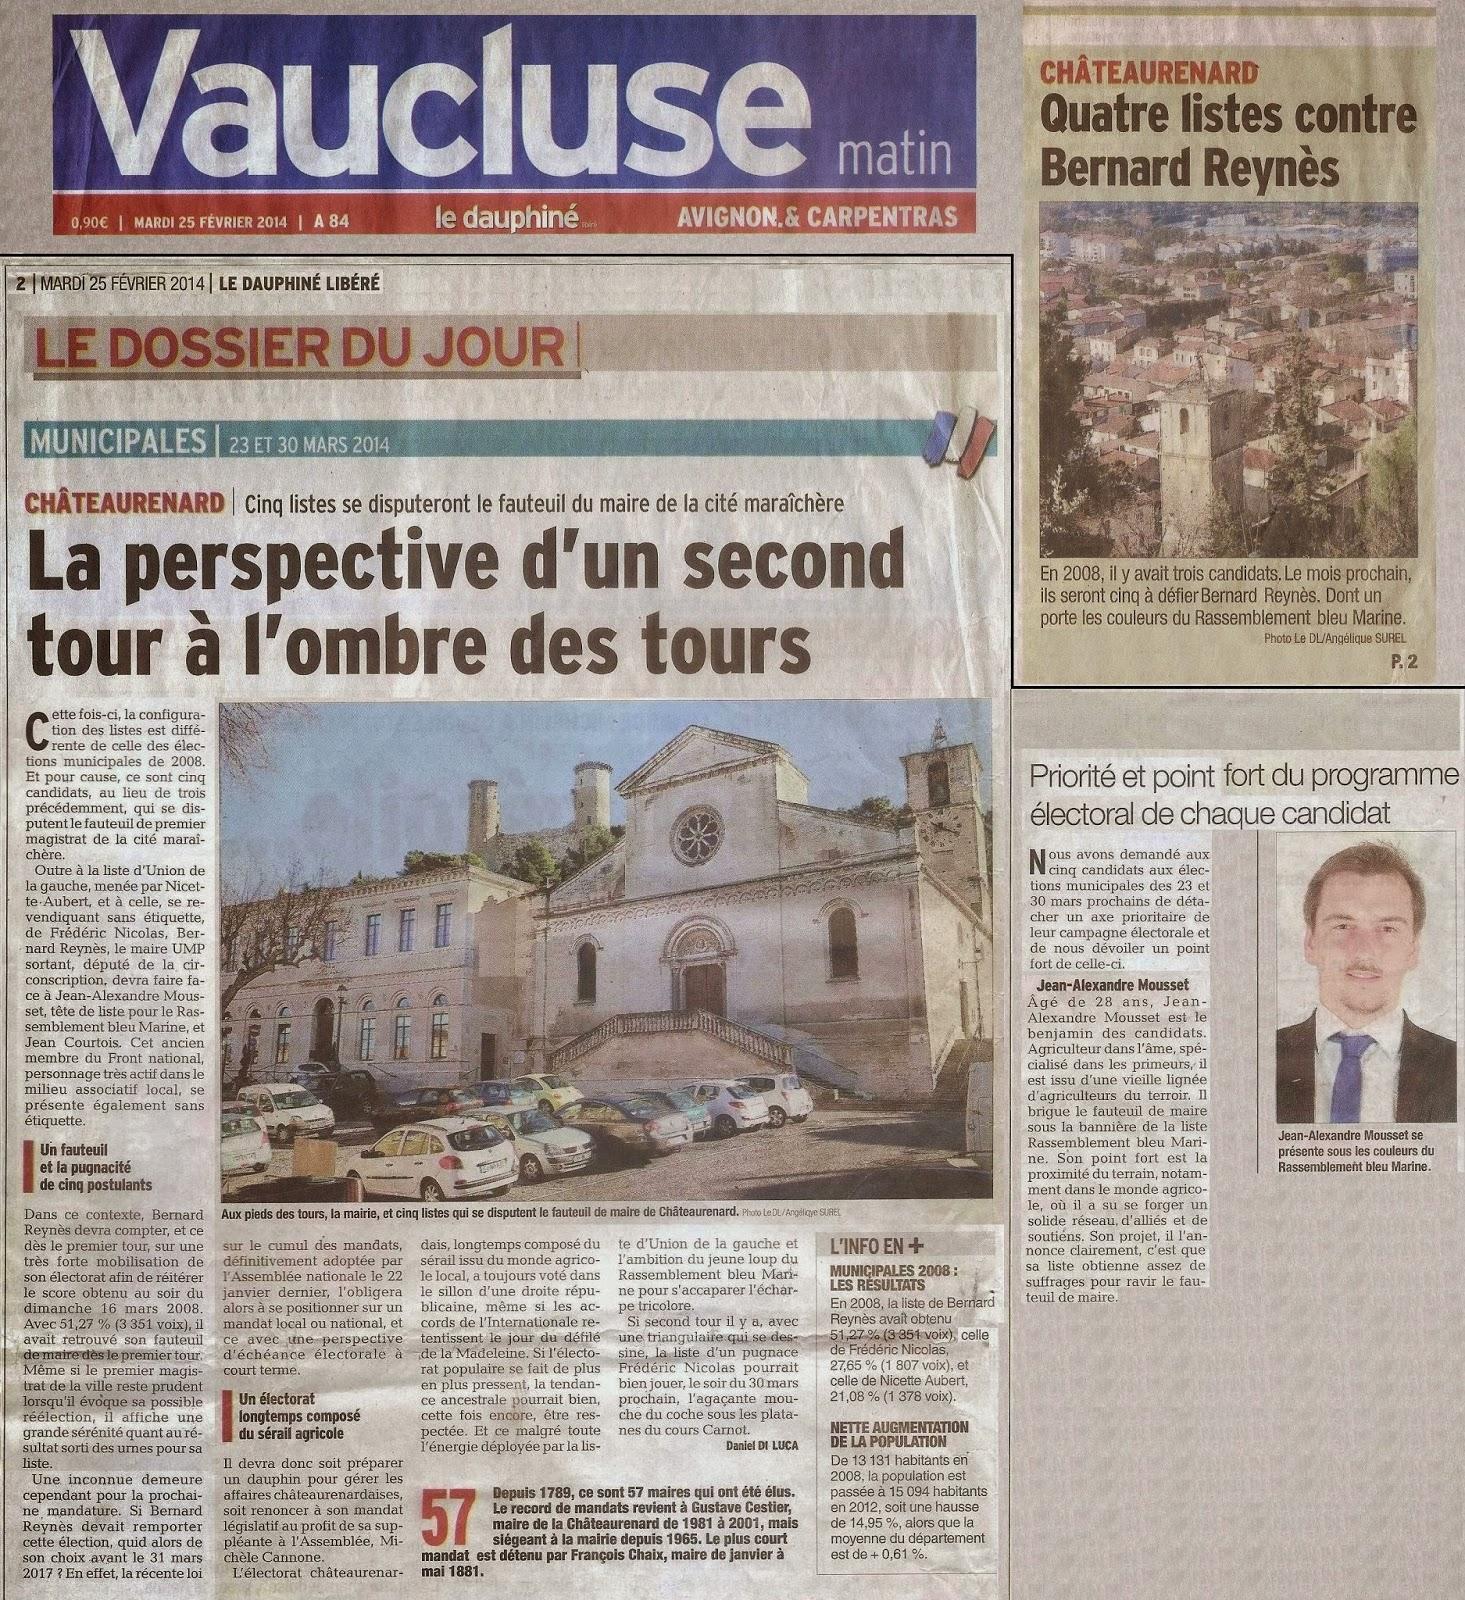 ch teaurenard bleu marine article du journal vaucluse matin le dauphin lib r du 25. Black Bedroom Furniture Sets. Home Design Ideas